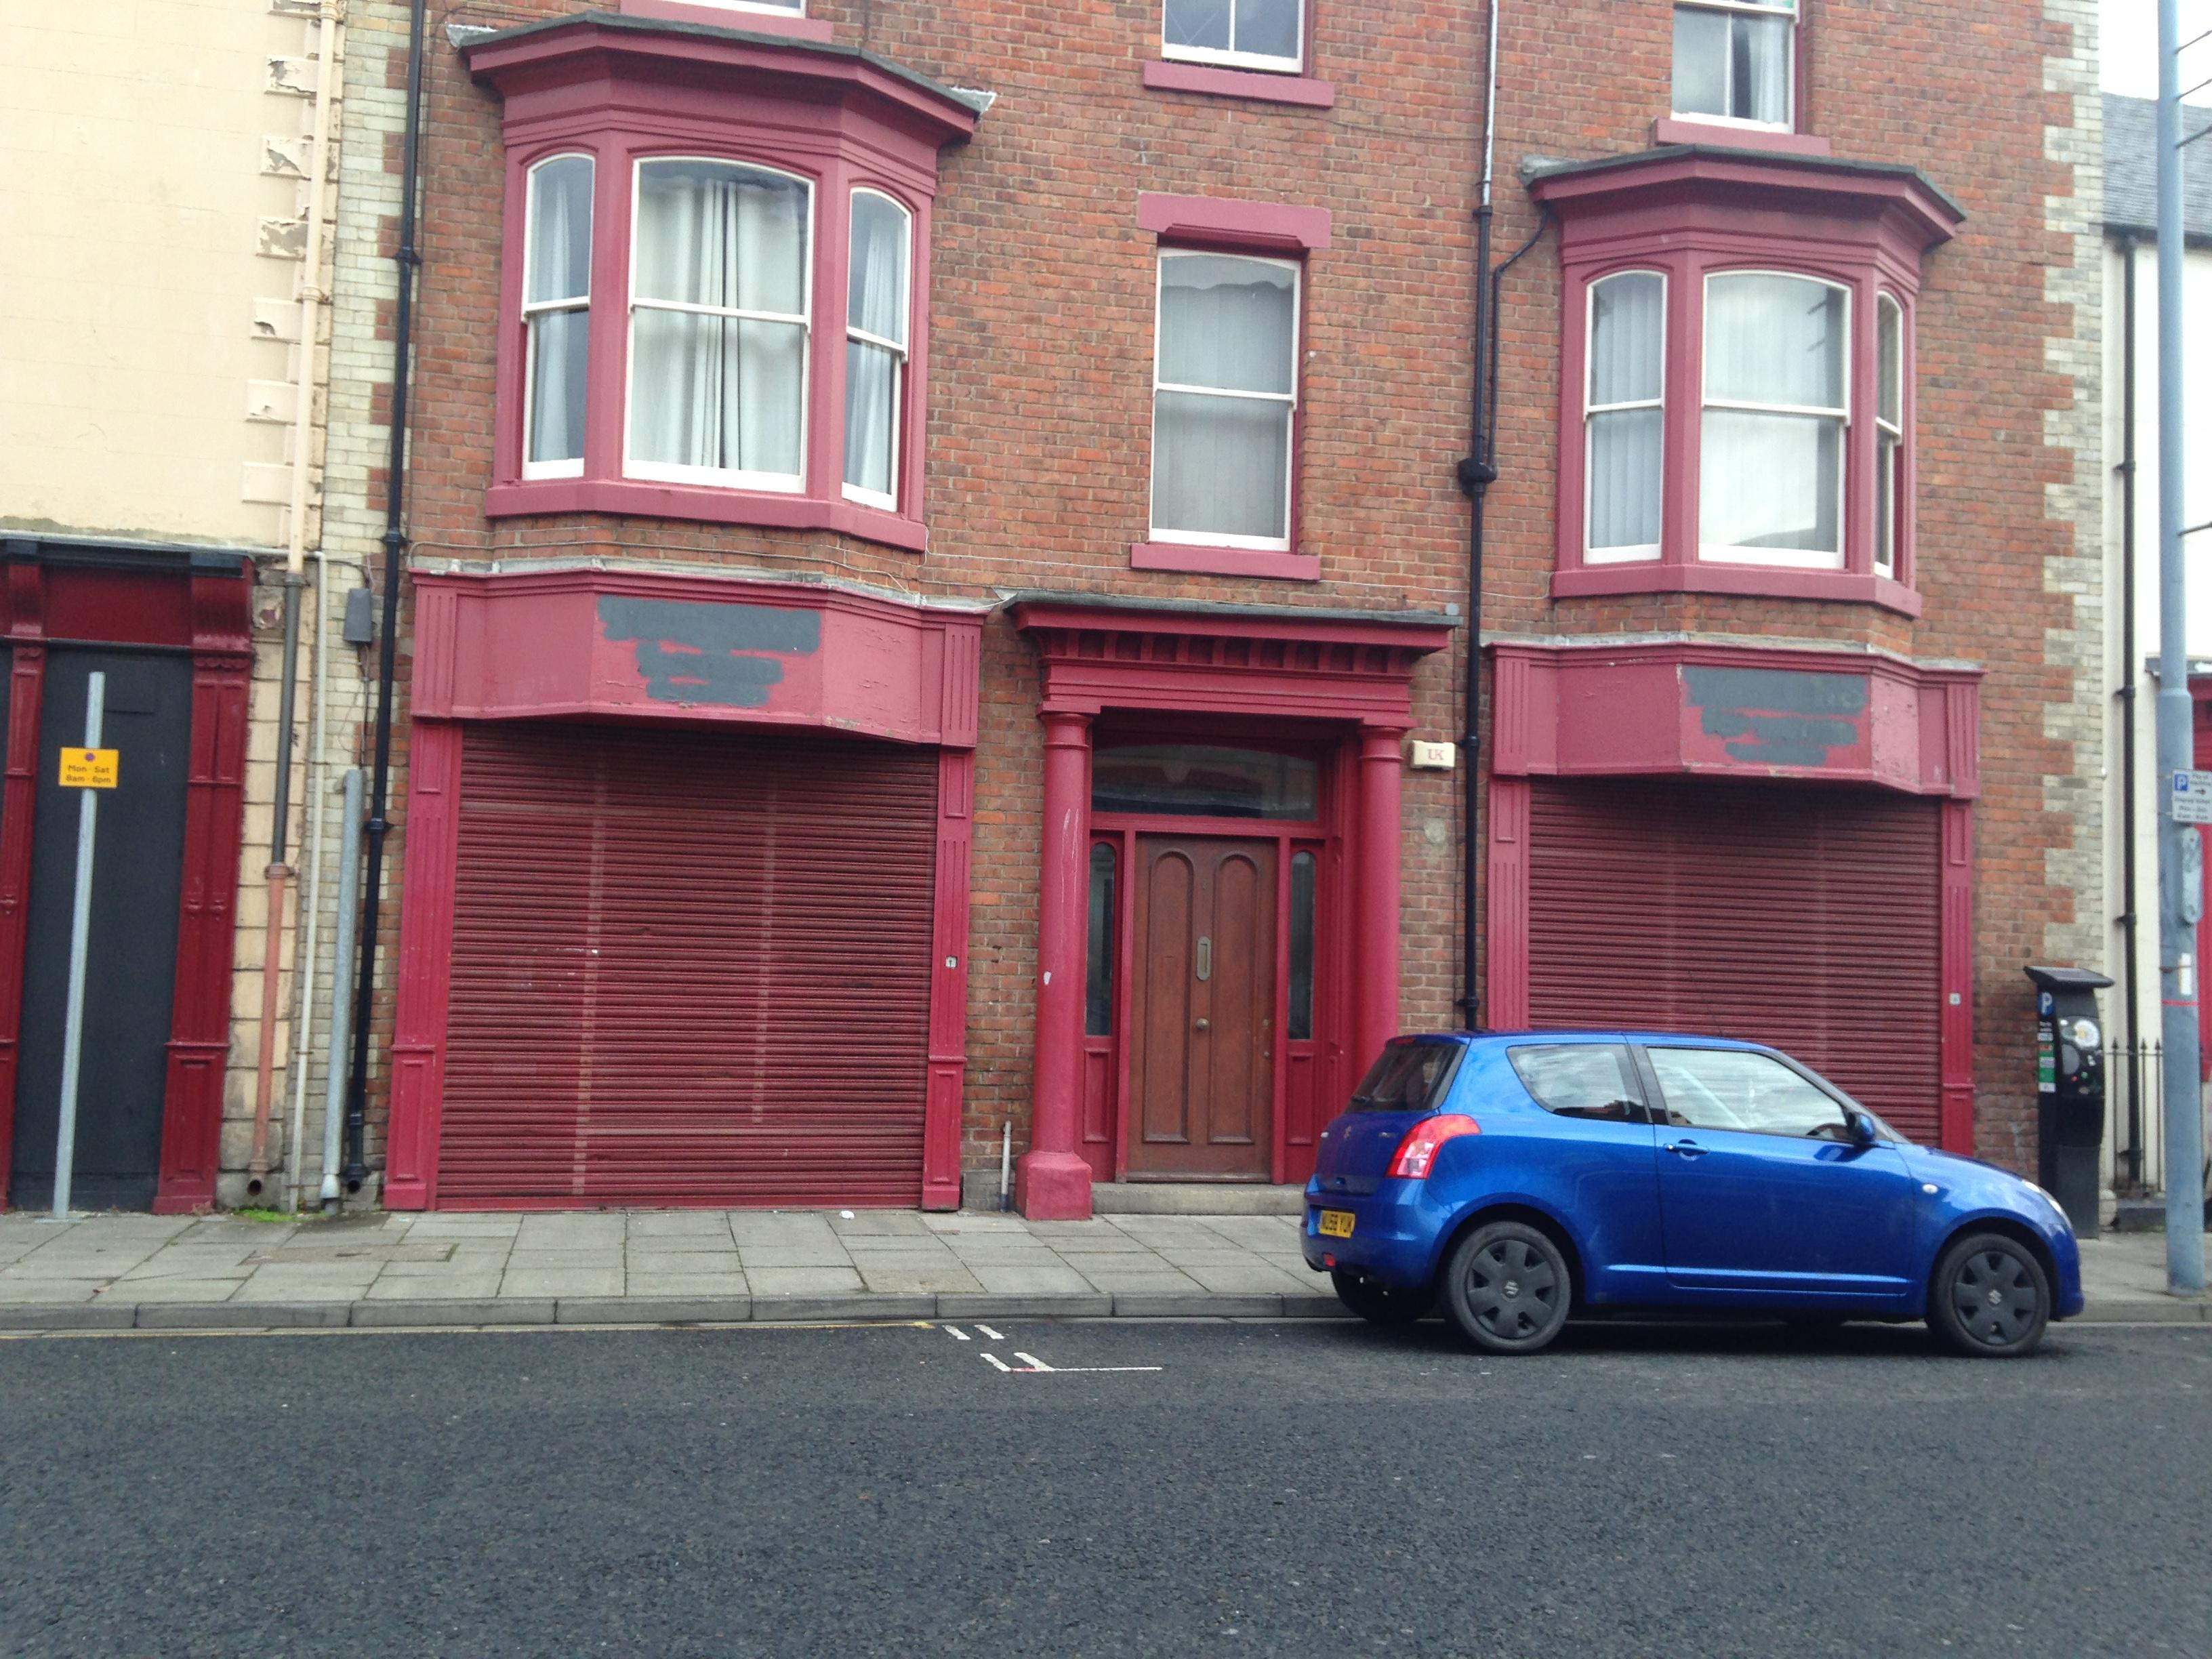 1 Tower Street, Hartlepool